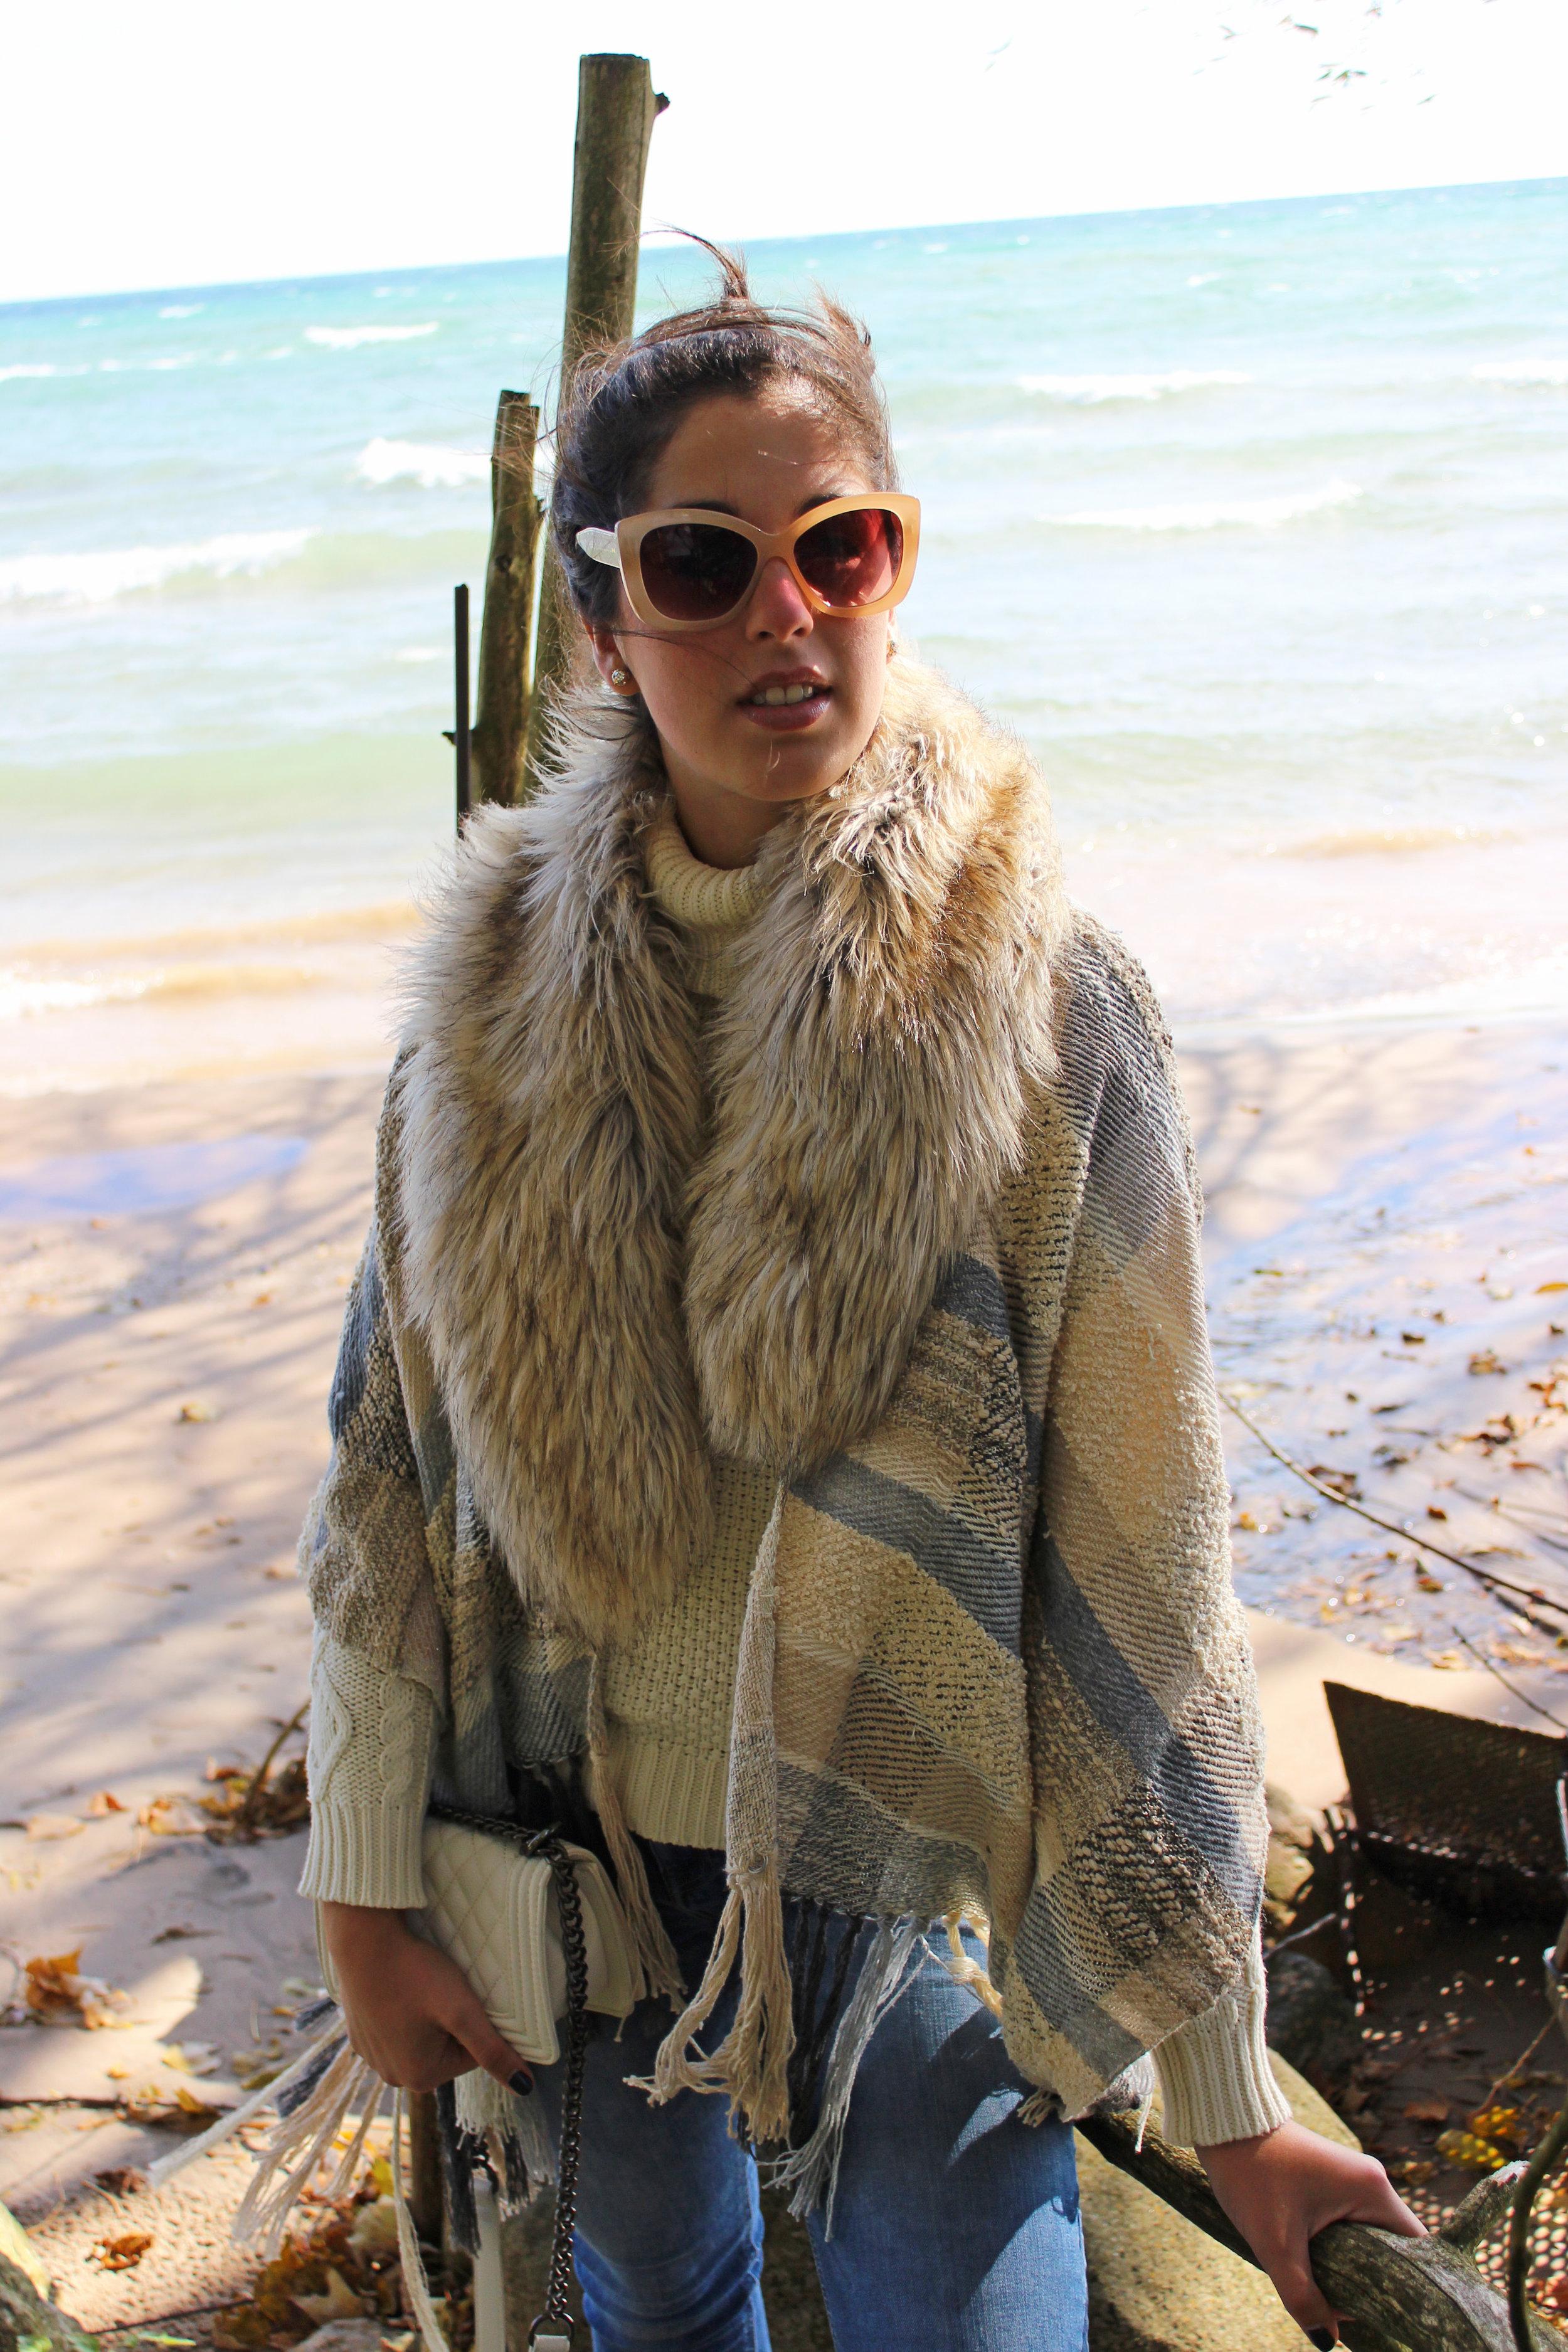 Madalyn Manzeck photographed by   Cassie Sterwald  in her backyard on Lake Michigan in 2016.    Poncho  Madalyn Joy Designs  // Turtleneck Sweater (similar) Ralph Lauren  // Faux Fur Stole (similar)  Anthropologie  // Jeans (similar)  Zara  // Heels (similar)  Madden Girl  // Earrings  Kate Spade  // Shoulder Bag  Forever 21  //  Nail Colour Taken By Storm Atlantic Pacific x Formula X